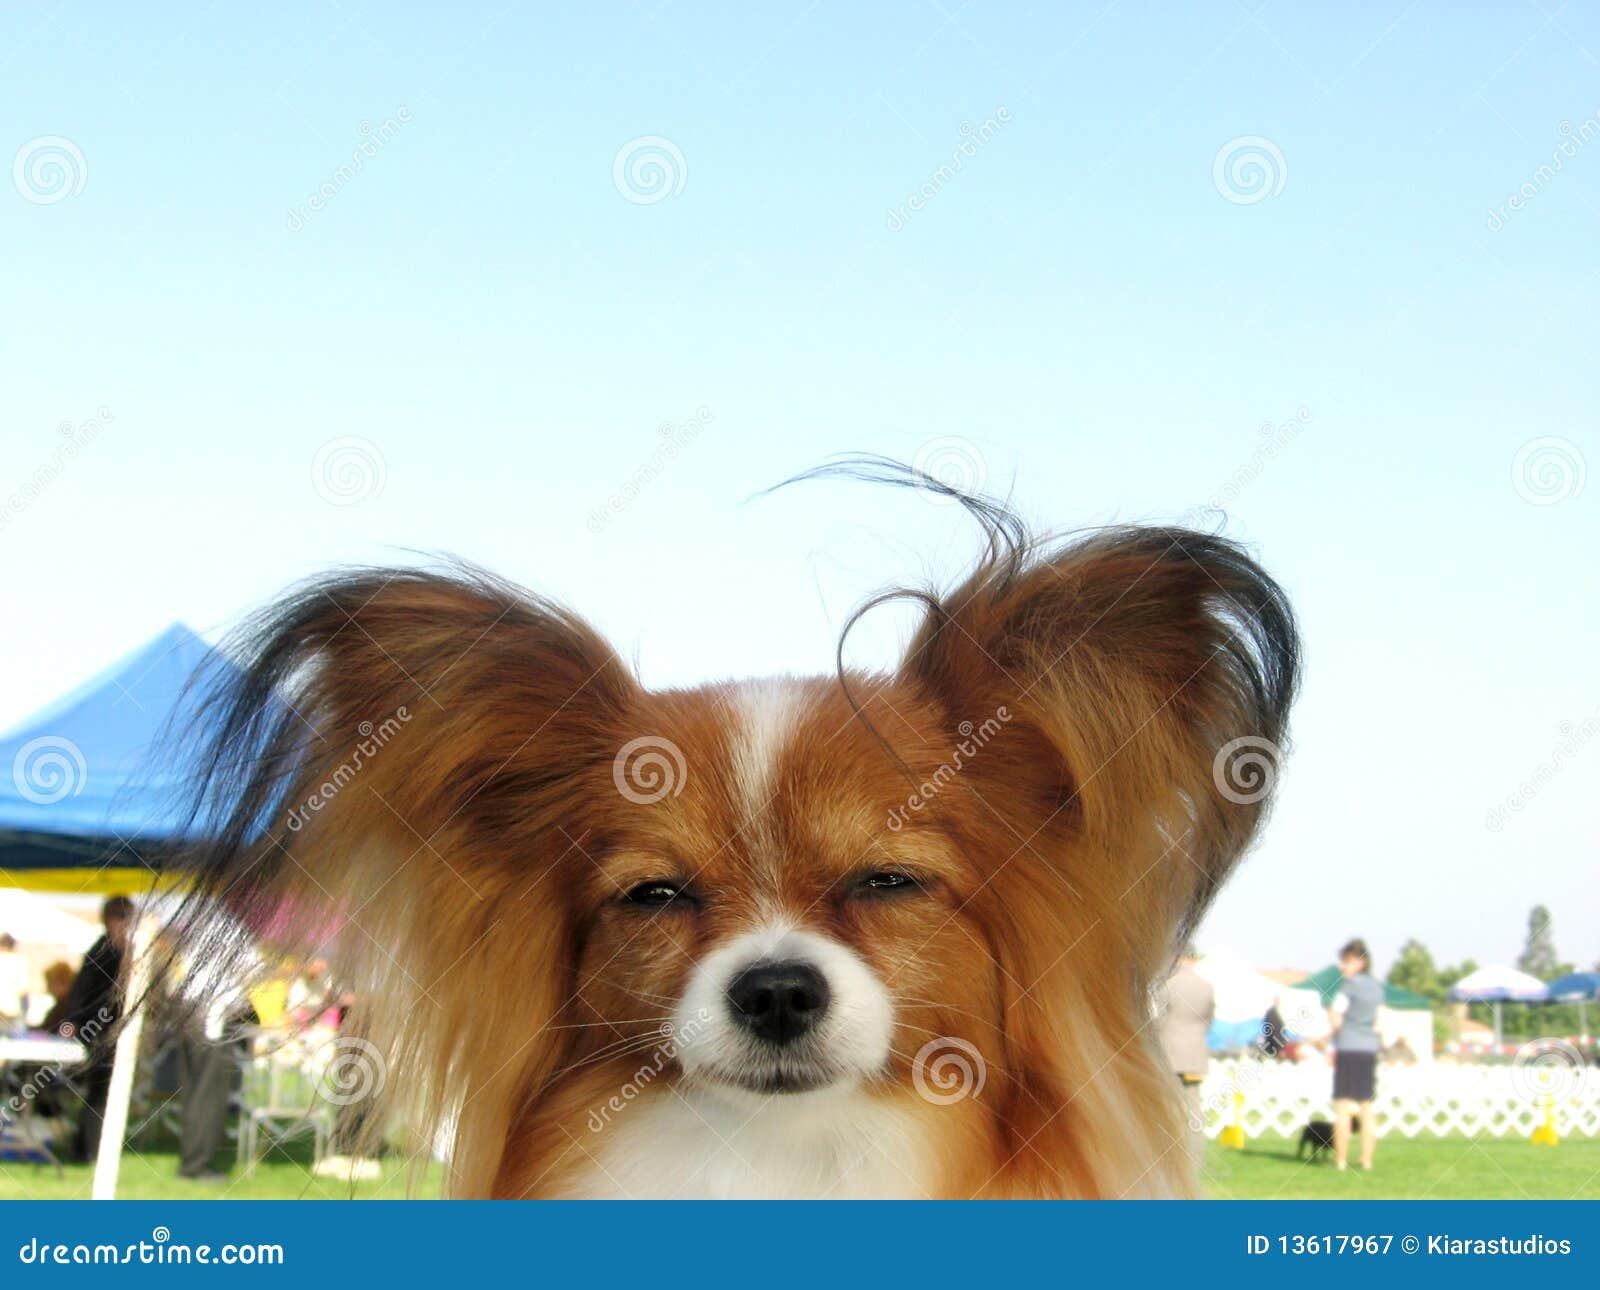 Red Sable Papillon Dog At A Dog Show